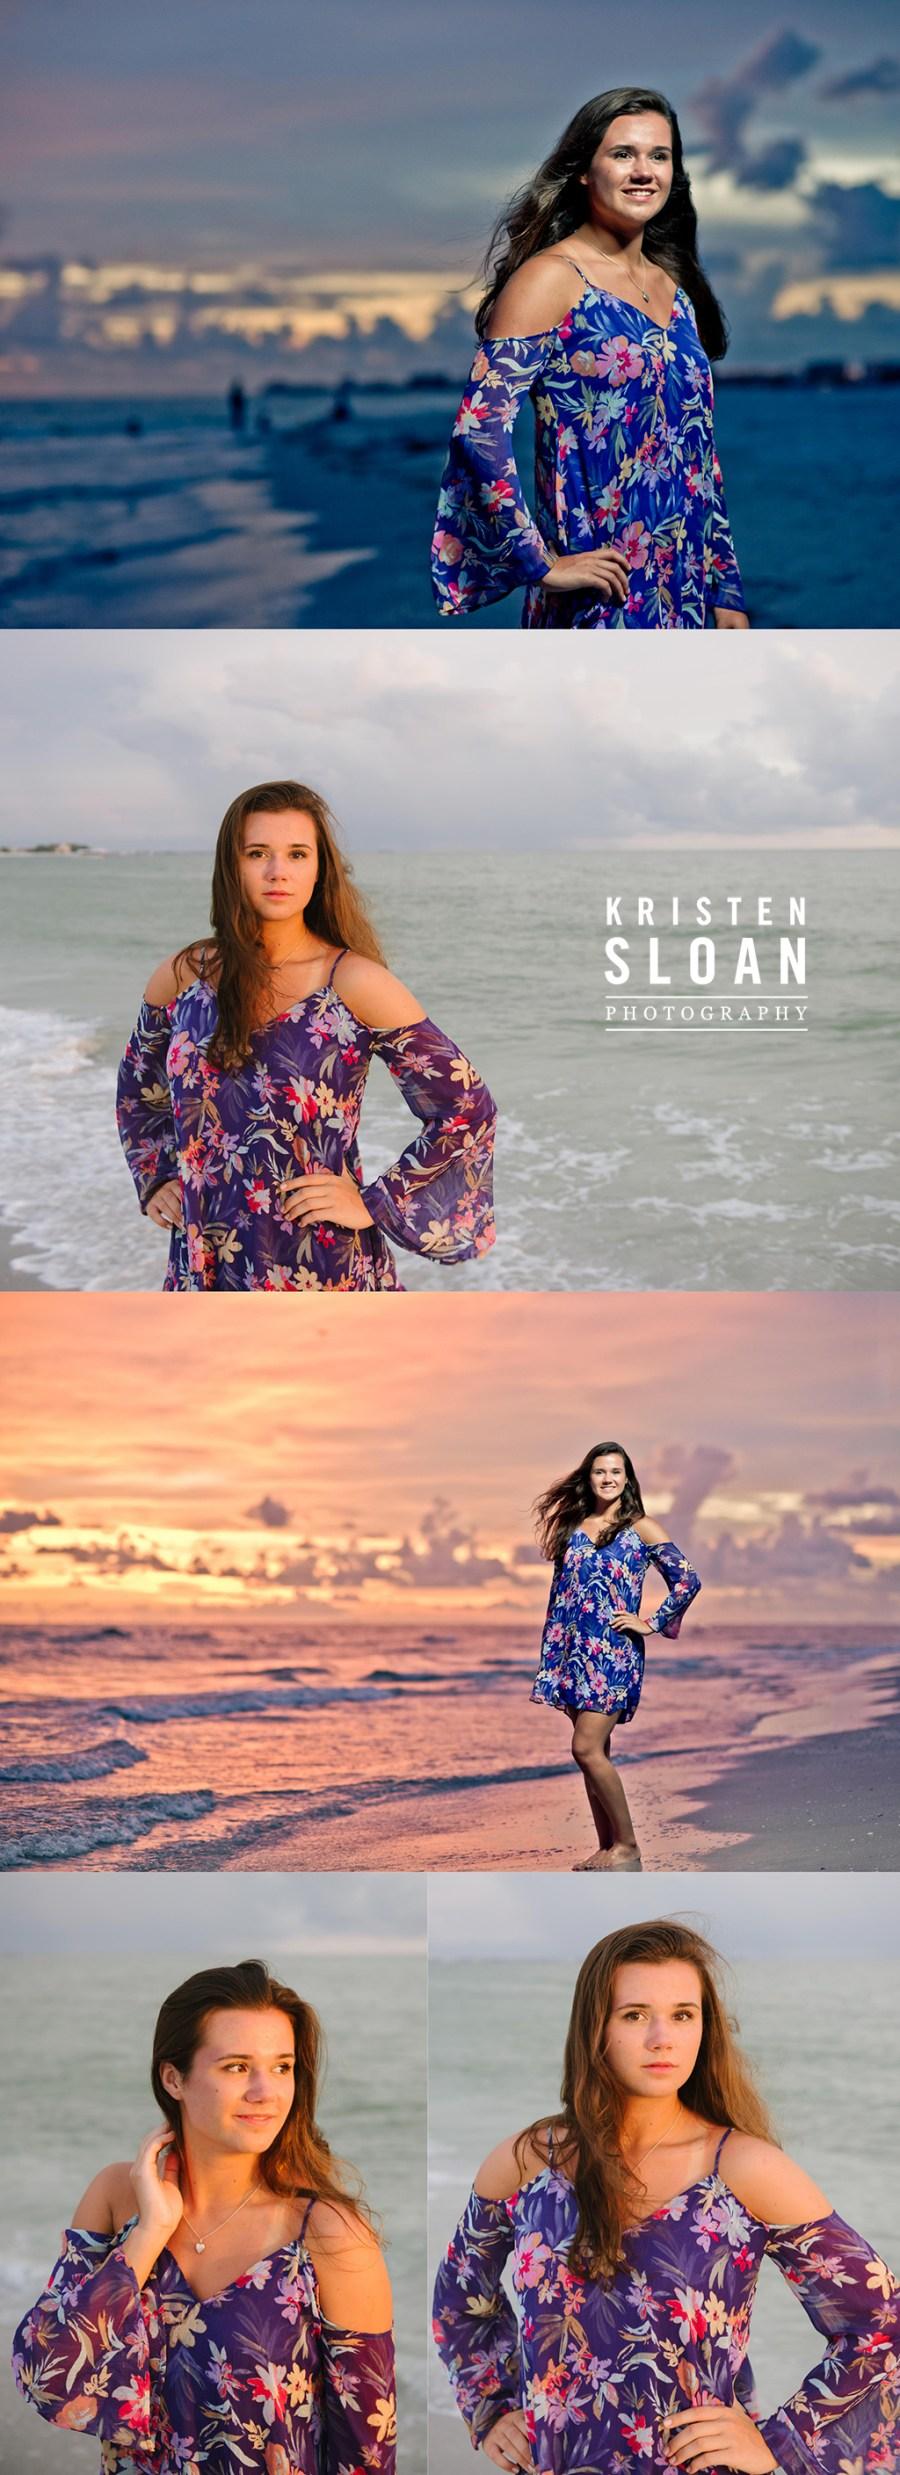 Sunset Senior Portraits at Treasure Island FL by Kristen Sloan